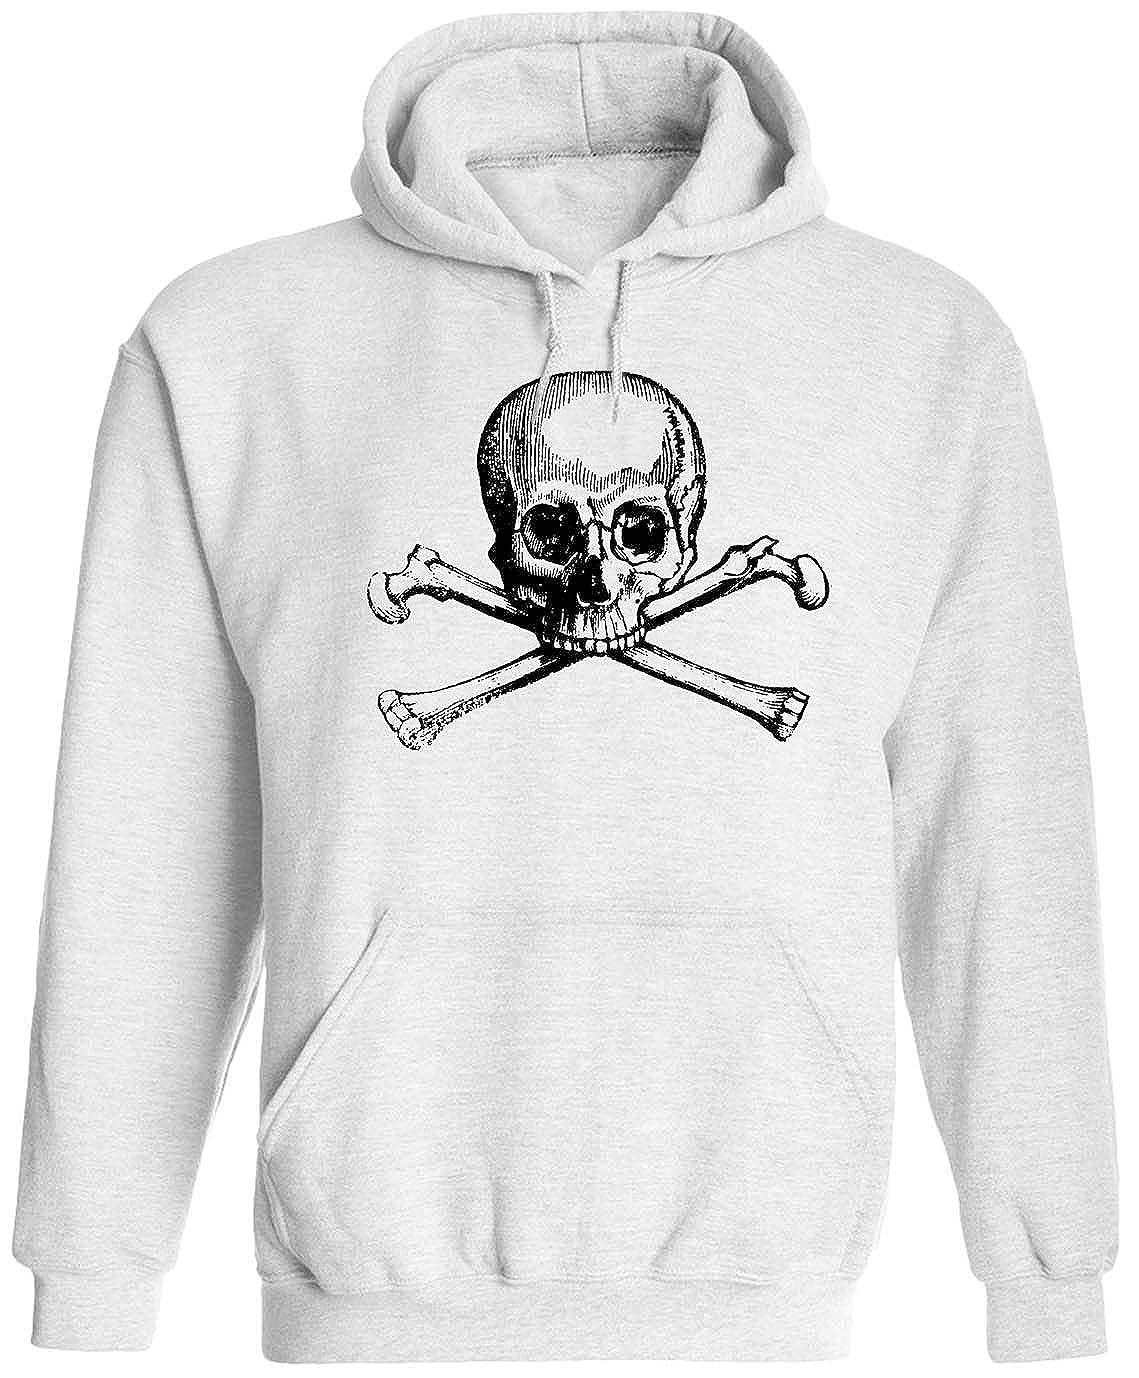 Austin Ink Apparel Skull and Crossbones Unisex Adult Hooded Pullover Sweatshirt